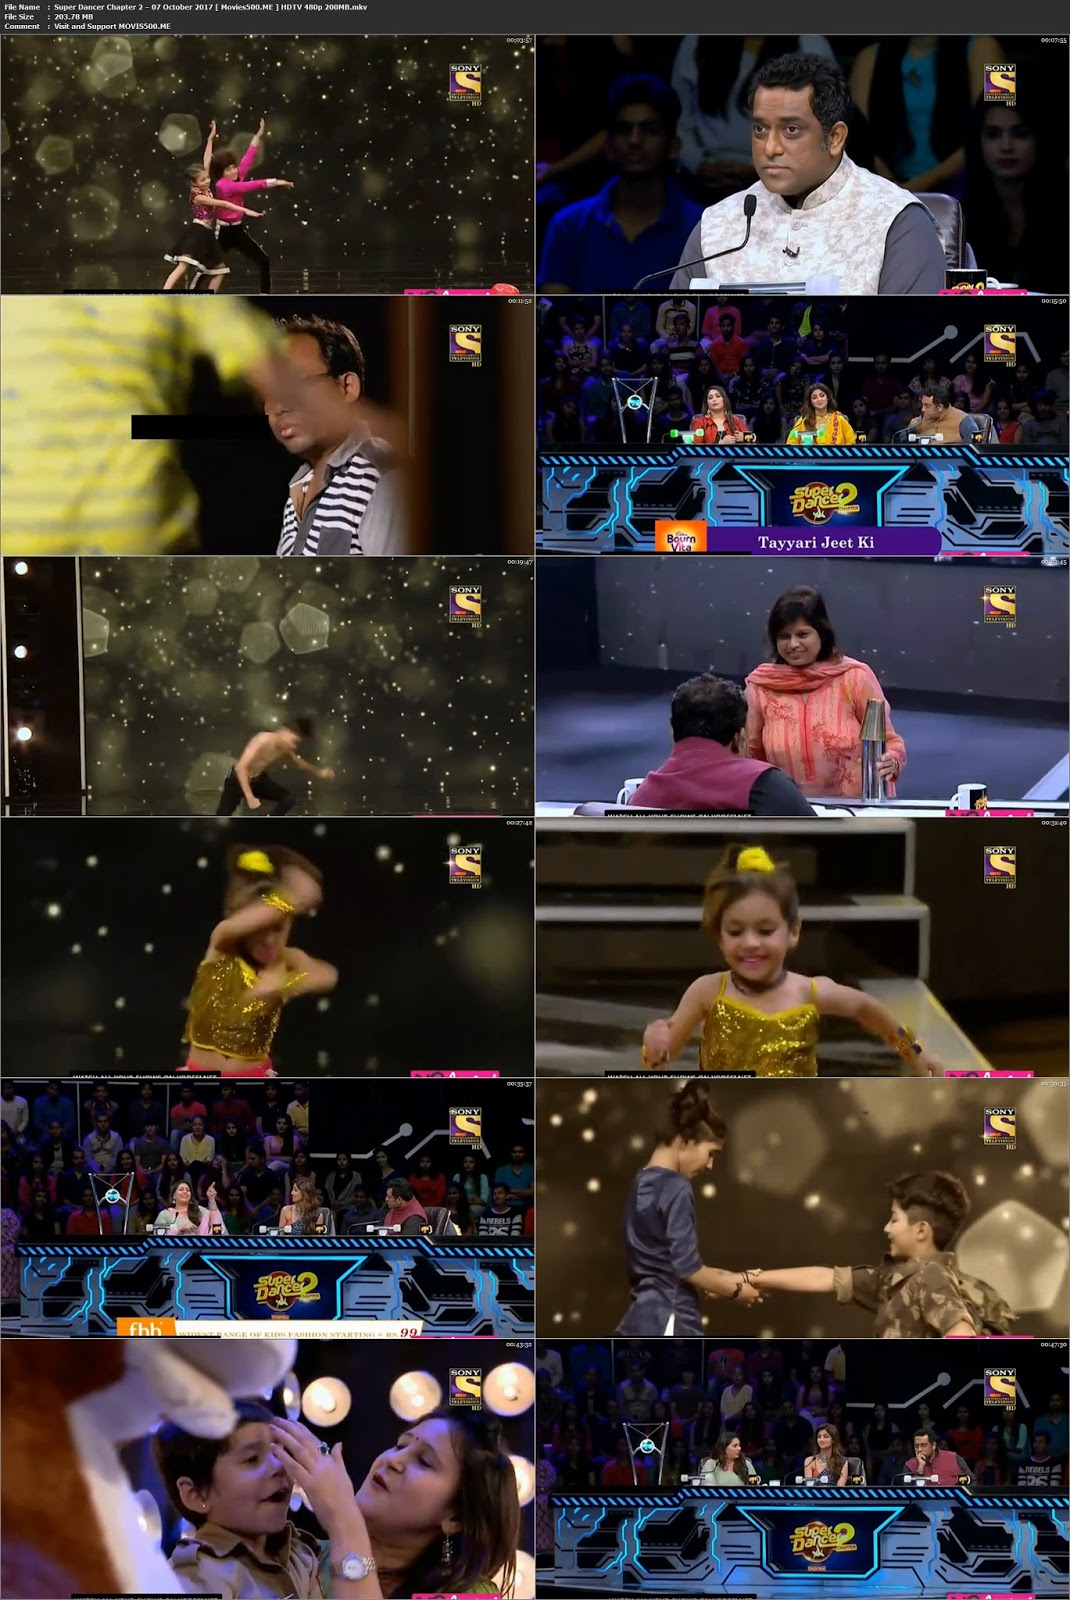 Super Dancer Chapter 2 2017 07 October HDTV 480p 200MB at movies500.info